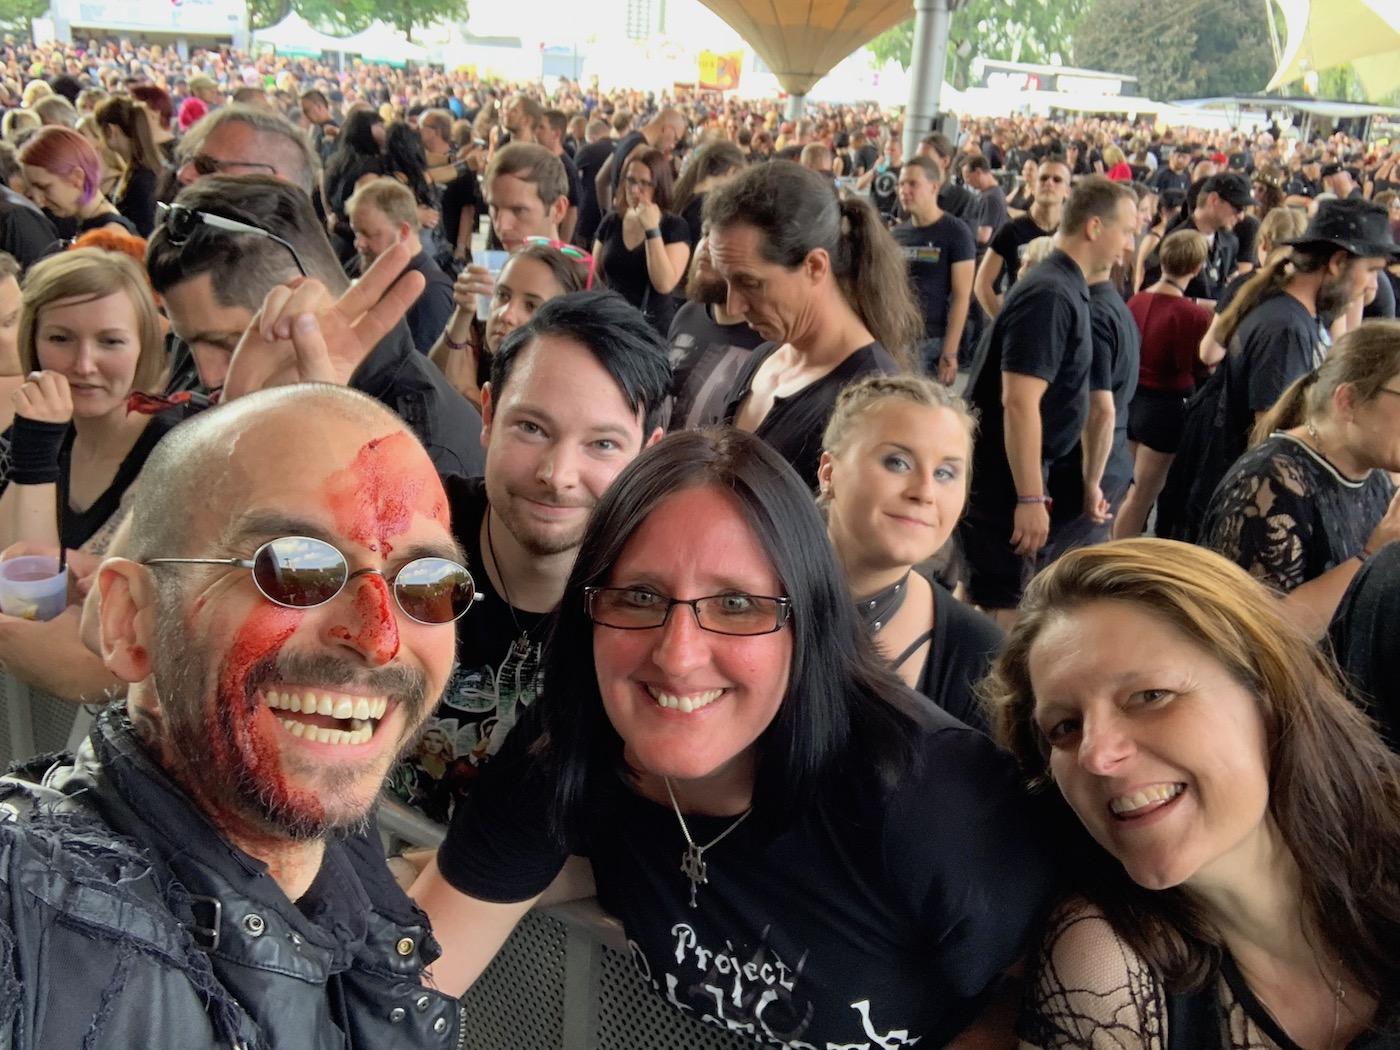 mark_benecke_amphi_festival_koeln_2019 - 196.jpg